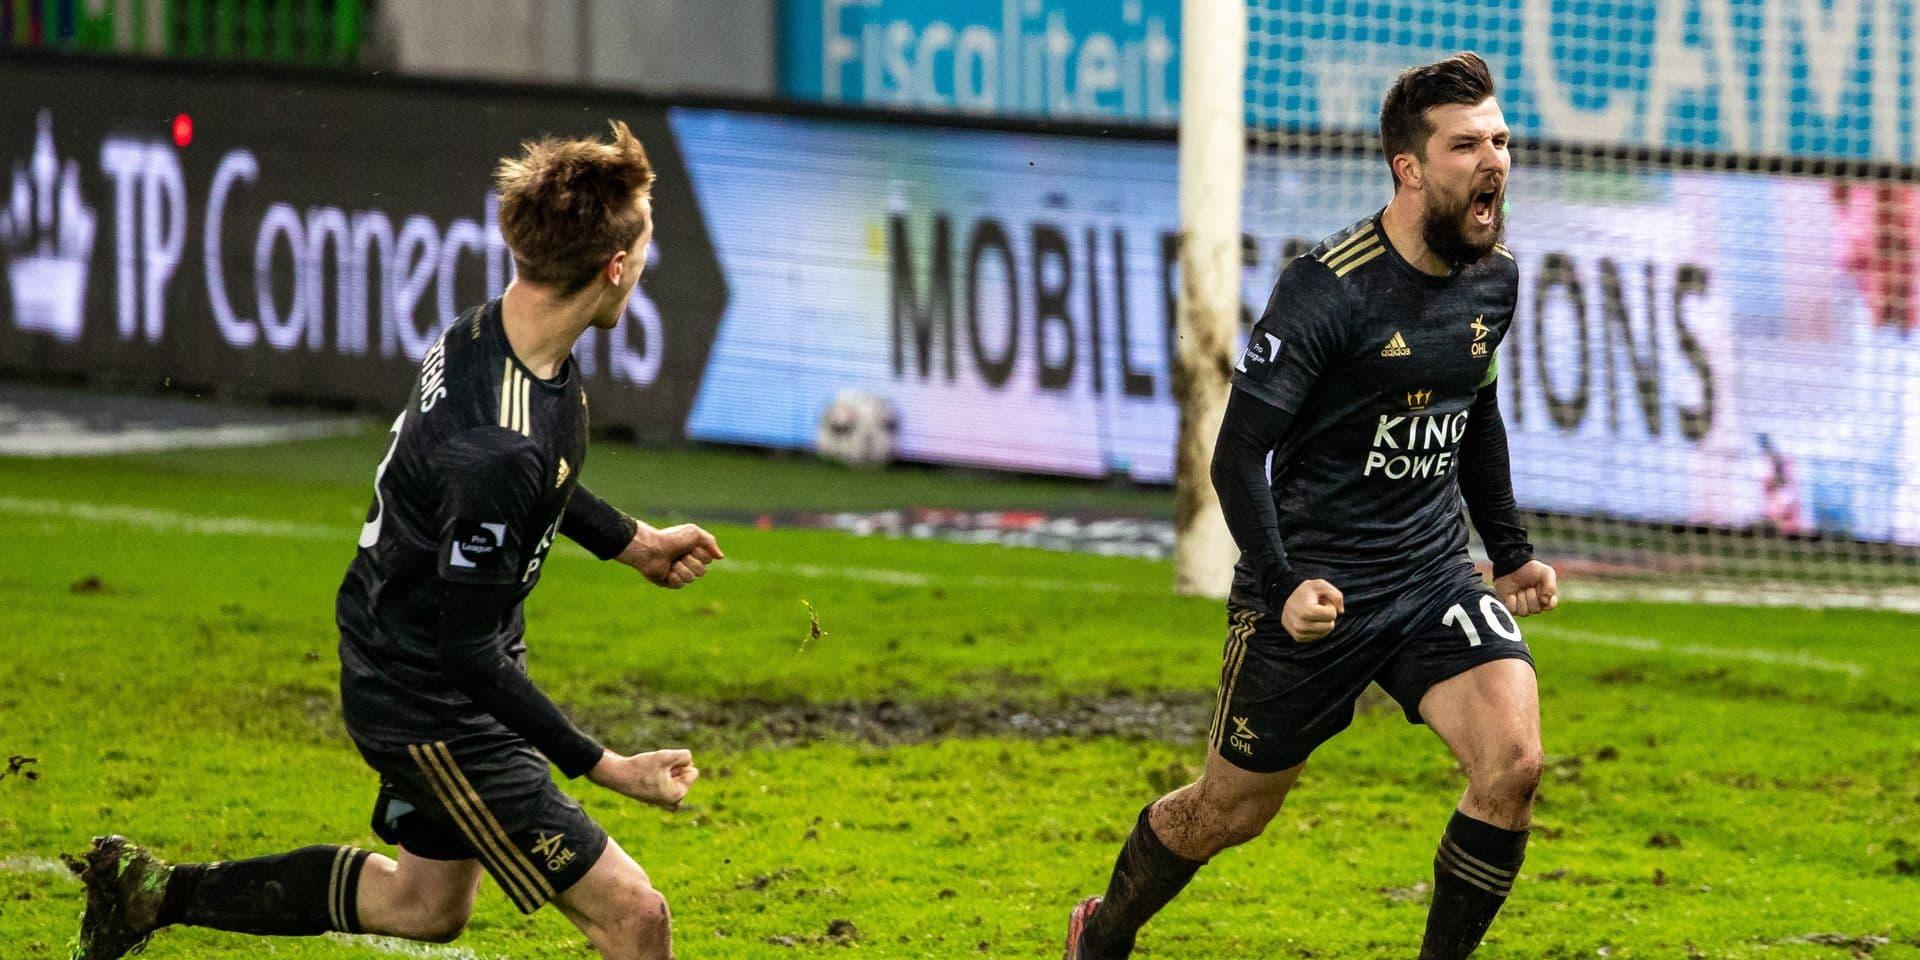 Mené 2-0, Oud-Heverlee Louvain s'impose 2-3 à Zulte Waregem